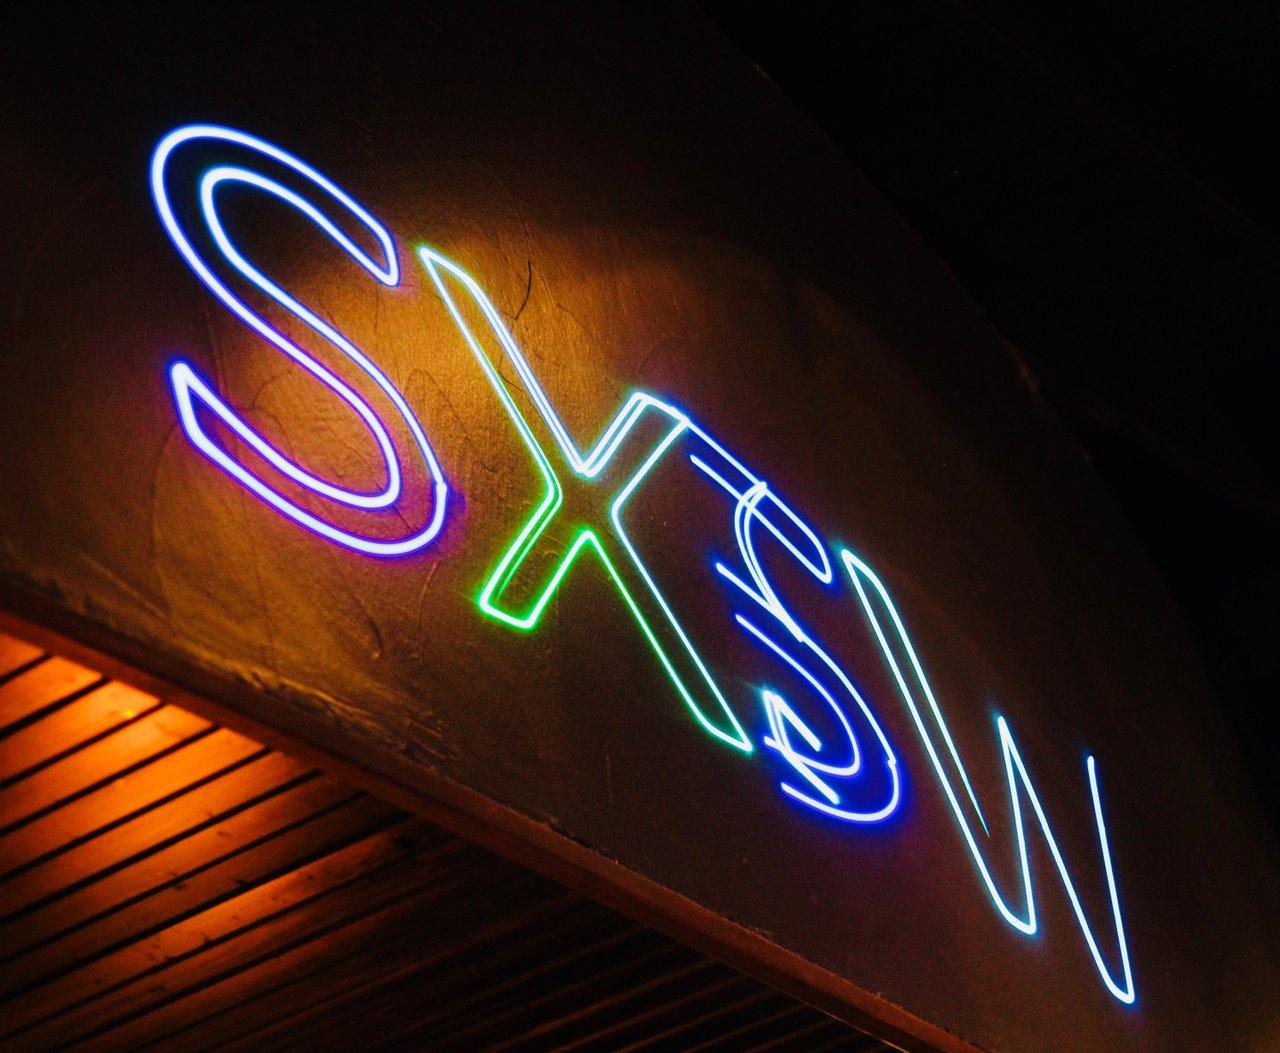 SXSW 18 photo IMG_6319.jpg